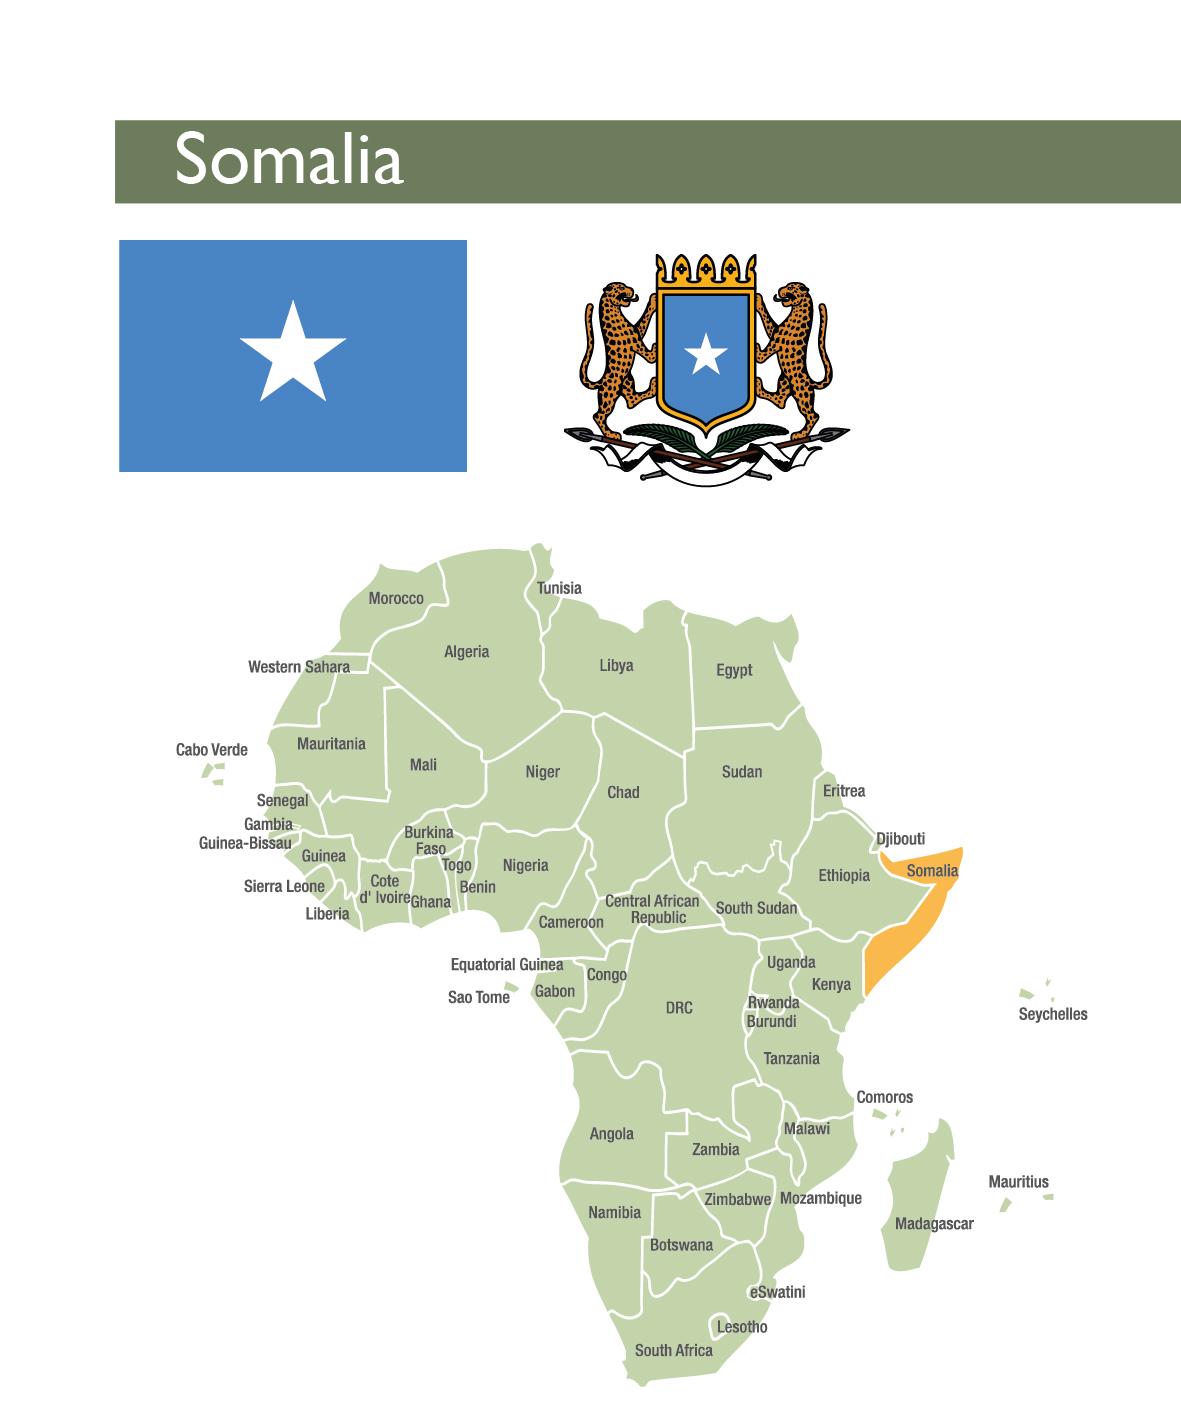 Somalia - CAHF   Centre for Affordable Housing Finance Africa